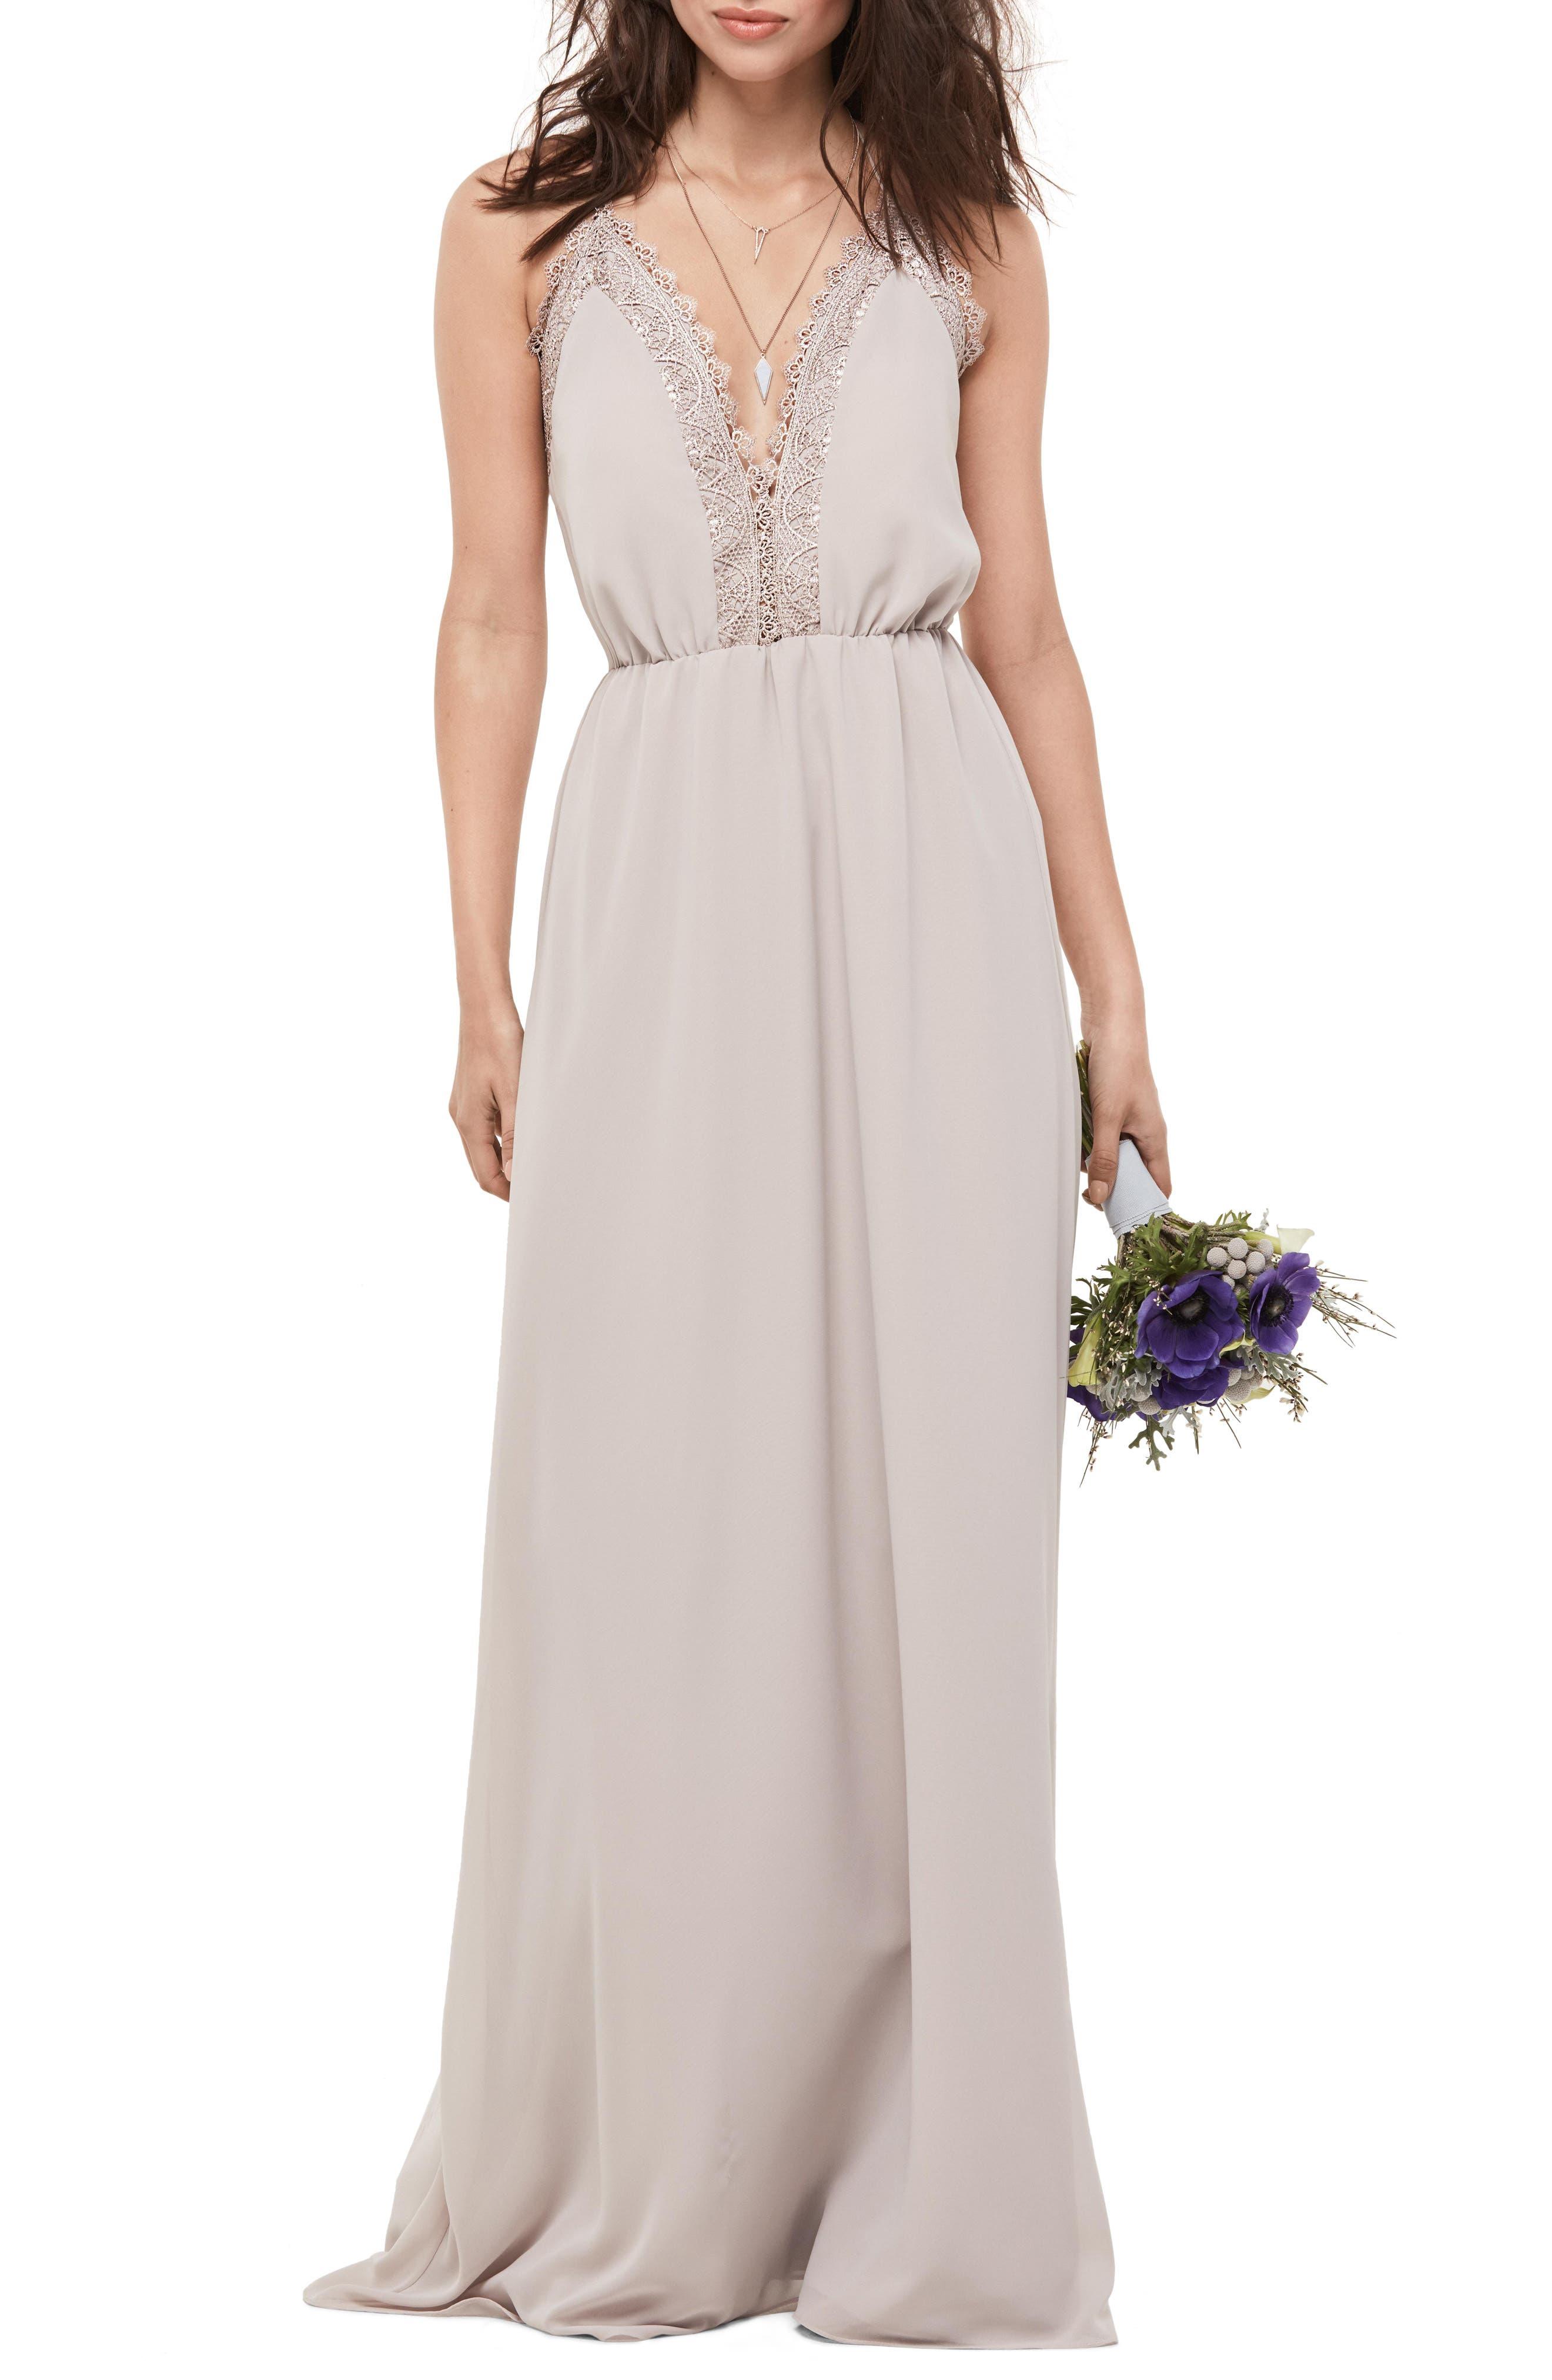 WTOO Lace Trim Chiffon Halter Gown, Main, color, 260